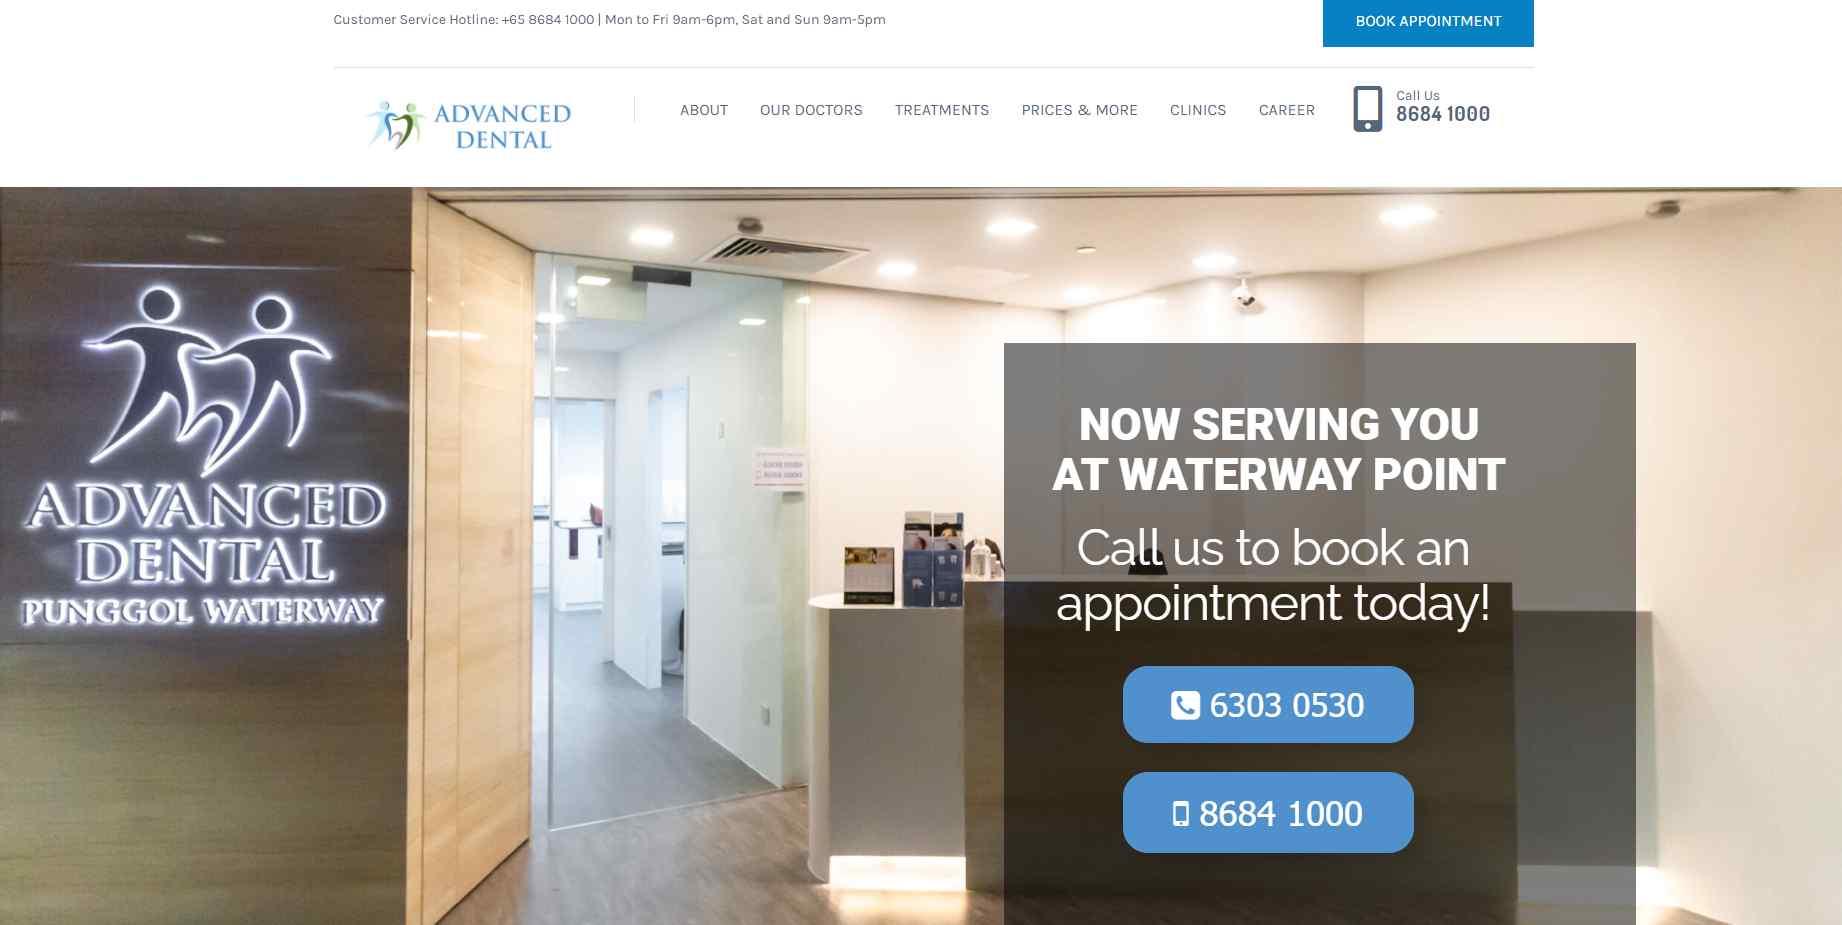 advanced dental Top Orthodontics & Clinics Providing Invisalign In Singapore